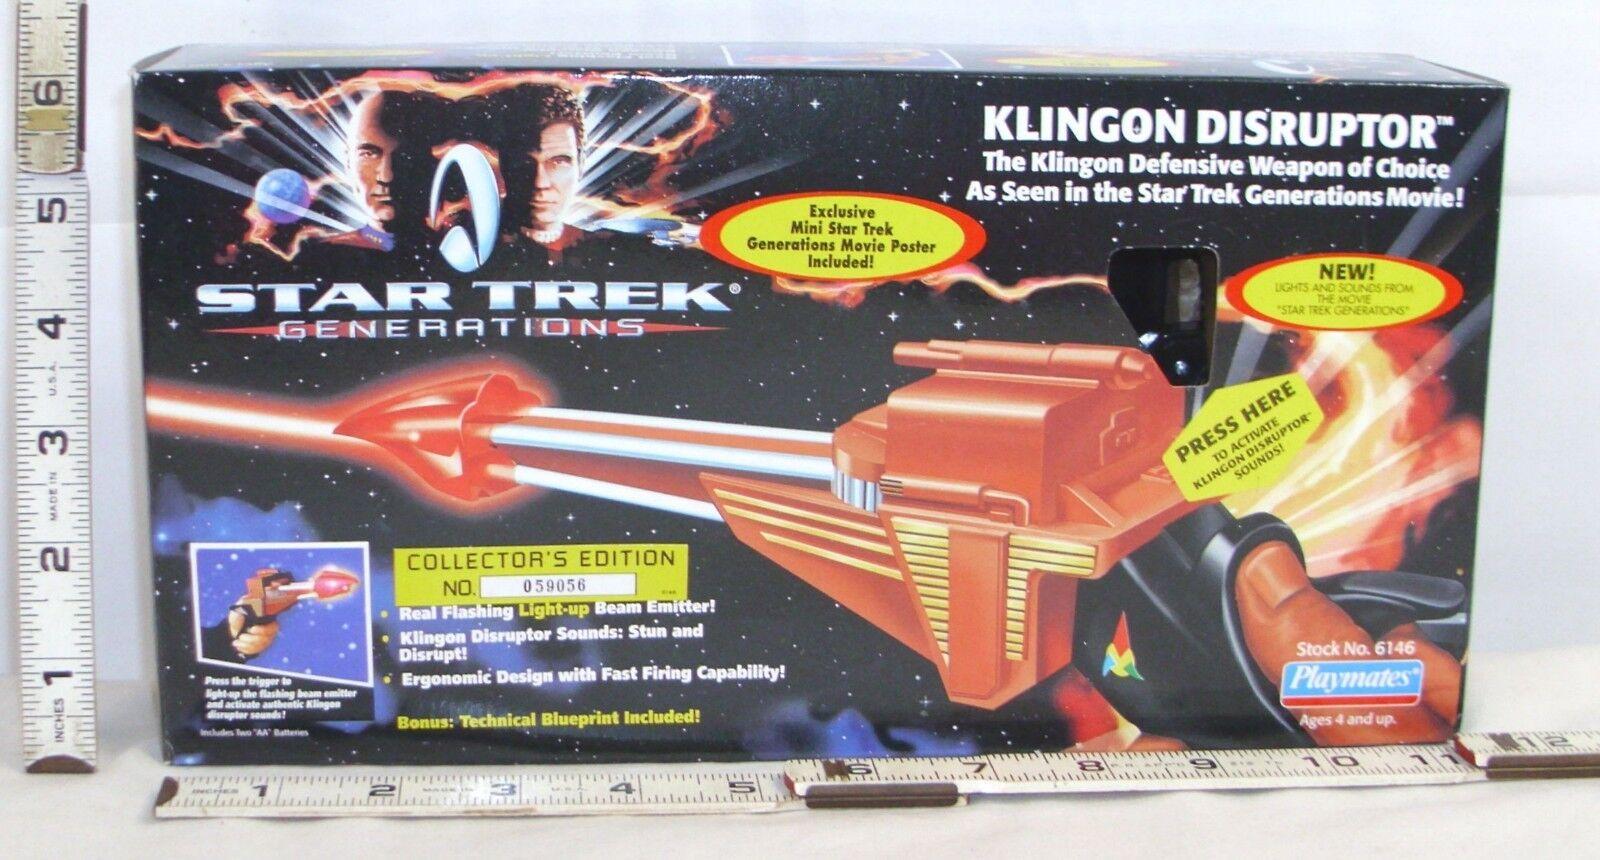 STAR TREK GENERATIONS KLINGON DISRUPTOR BOXED PLAYMATES SEALED  6146 1994